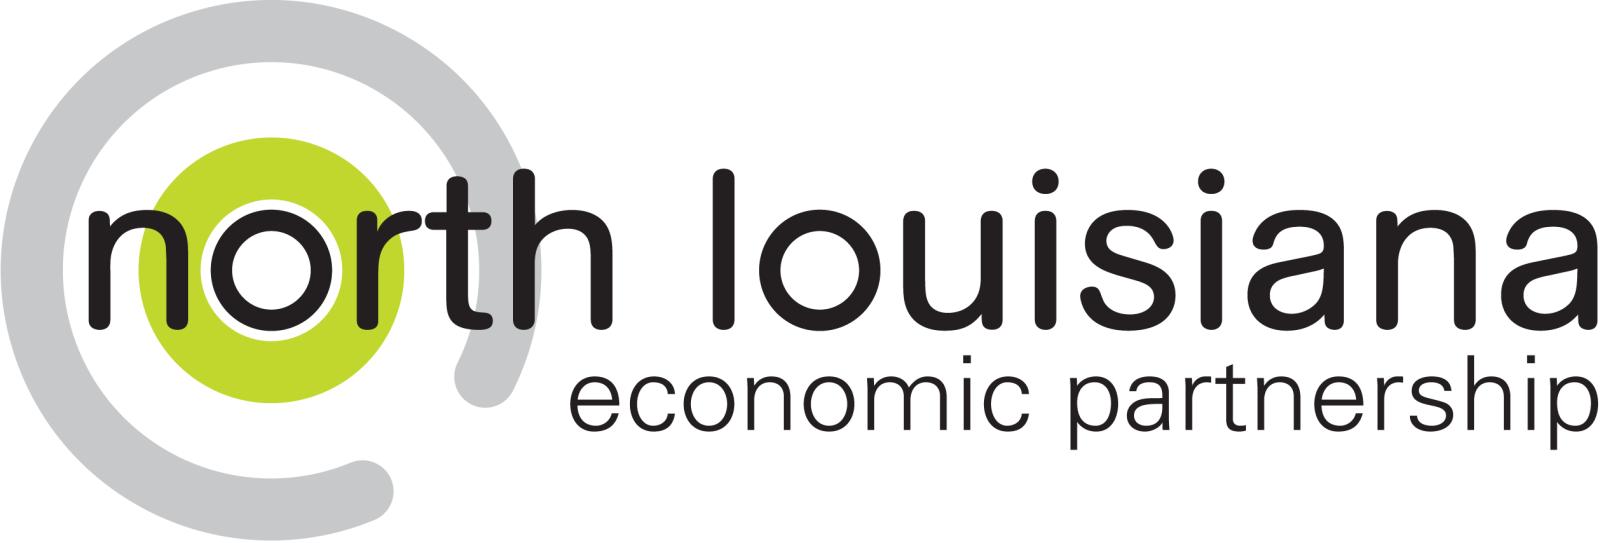 North Louisiana Economic Partnership